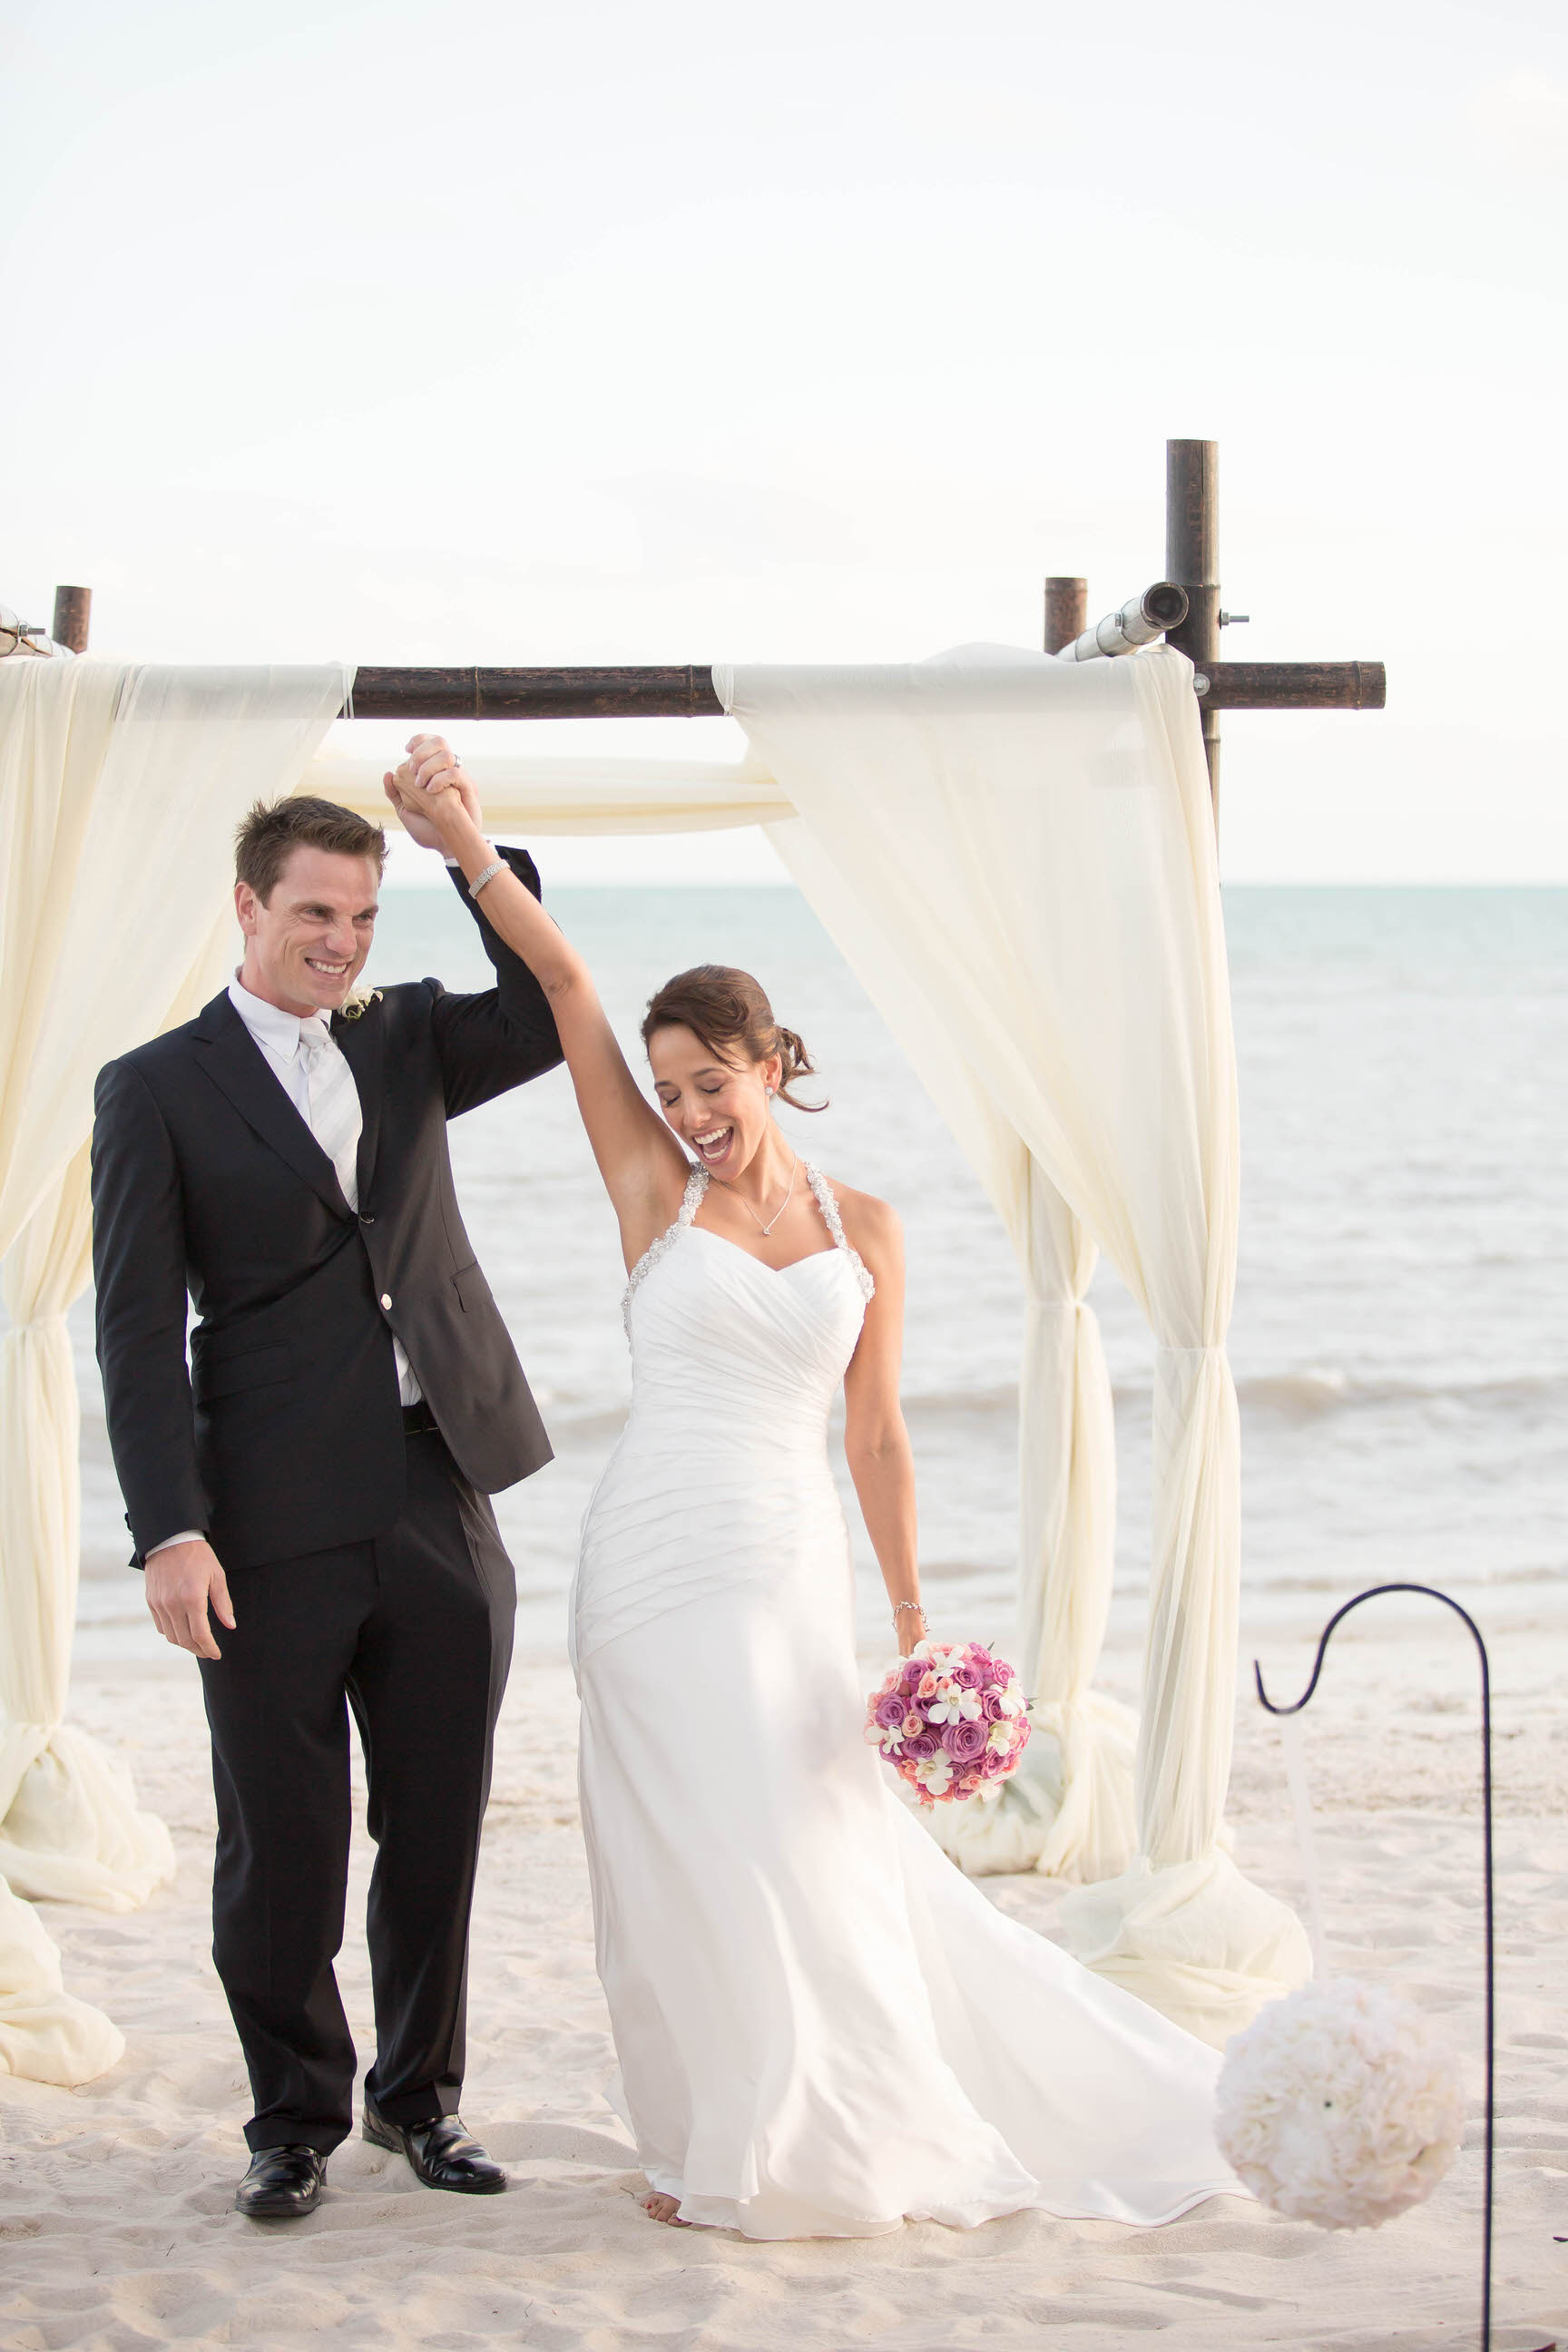 yes_emotional_moments_tiny_house_photo_beach_destination_wedding.jpg